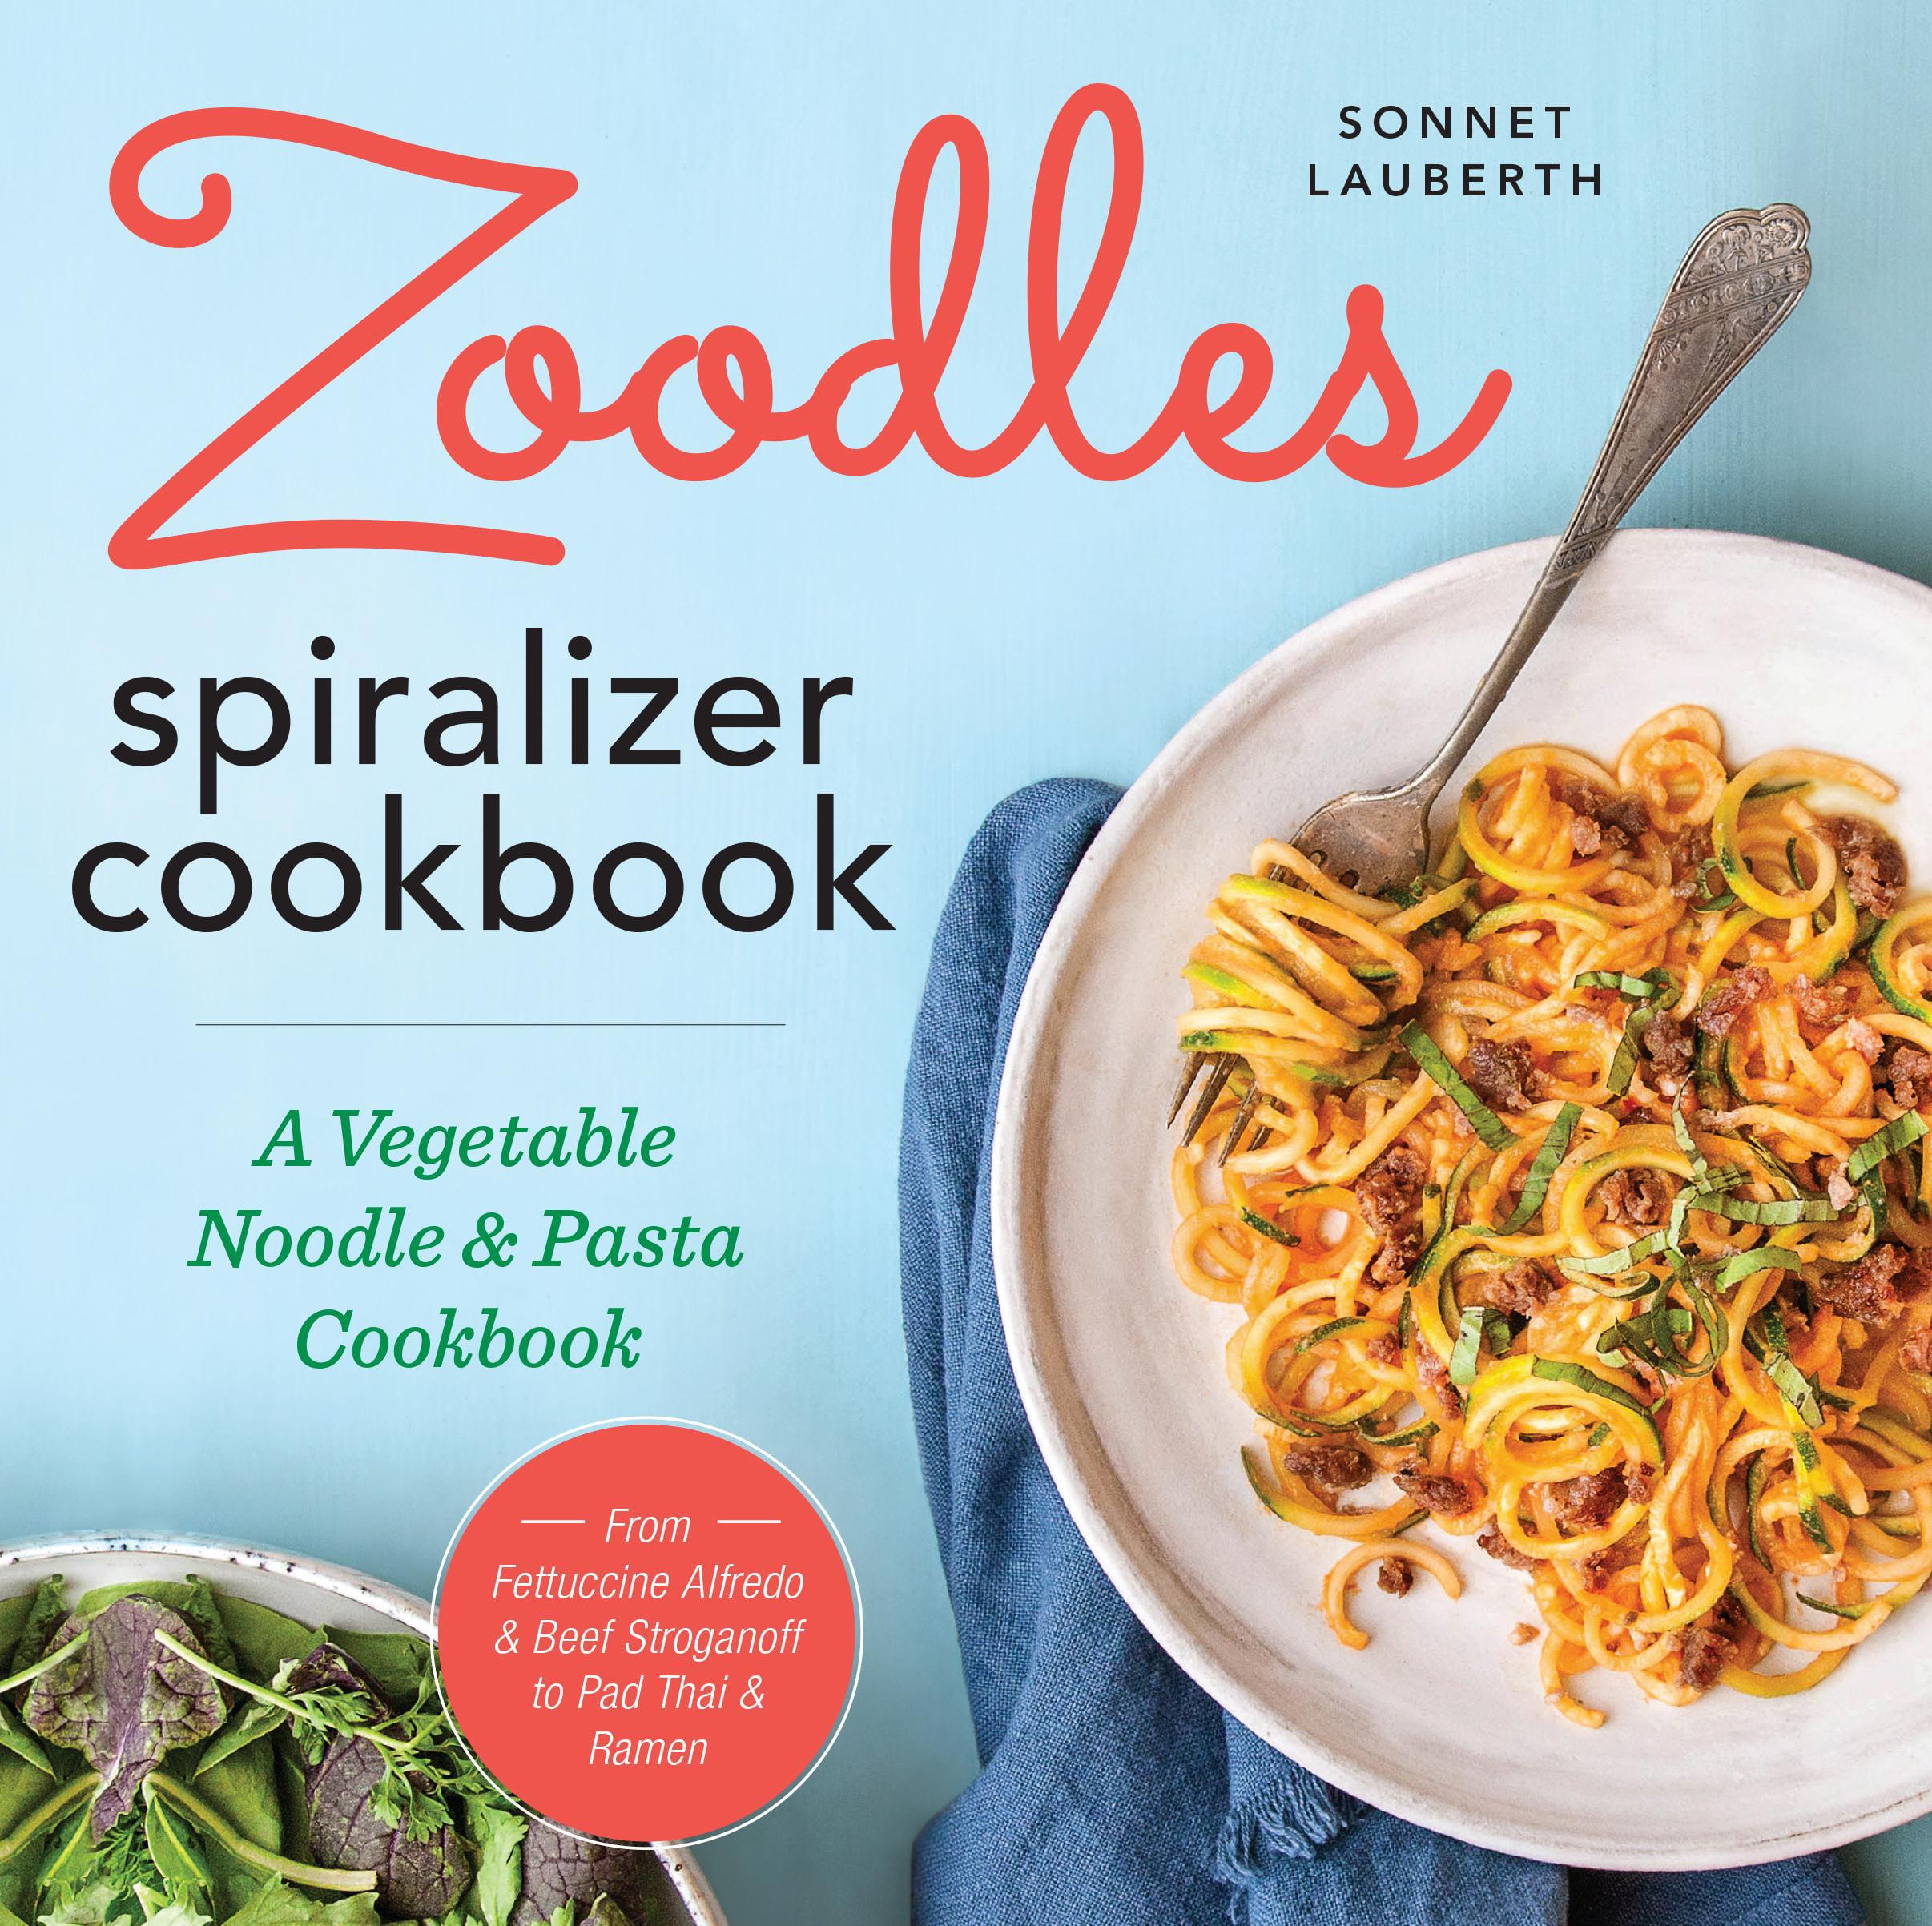 Zoodles Spiralizer Cookbook : A Vegetable Noodle and Pasta Cookbook ...